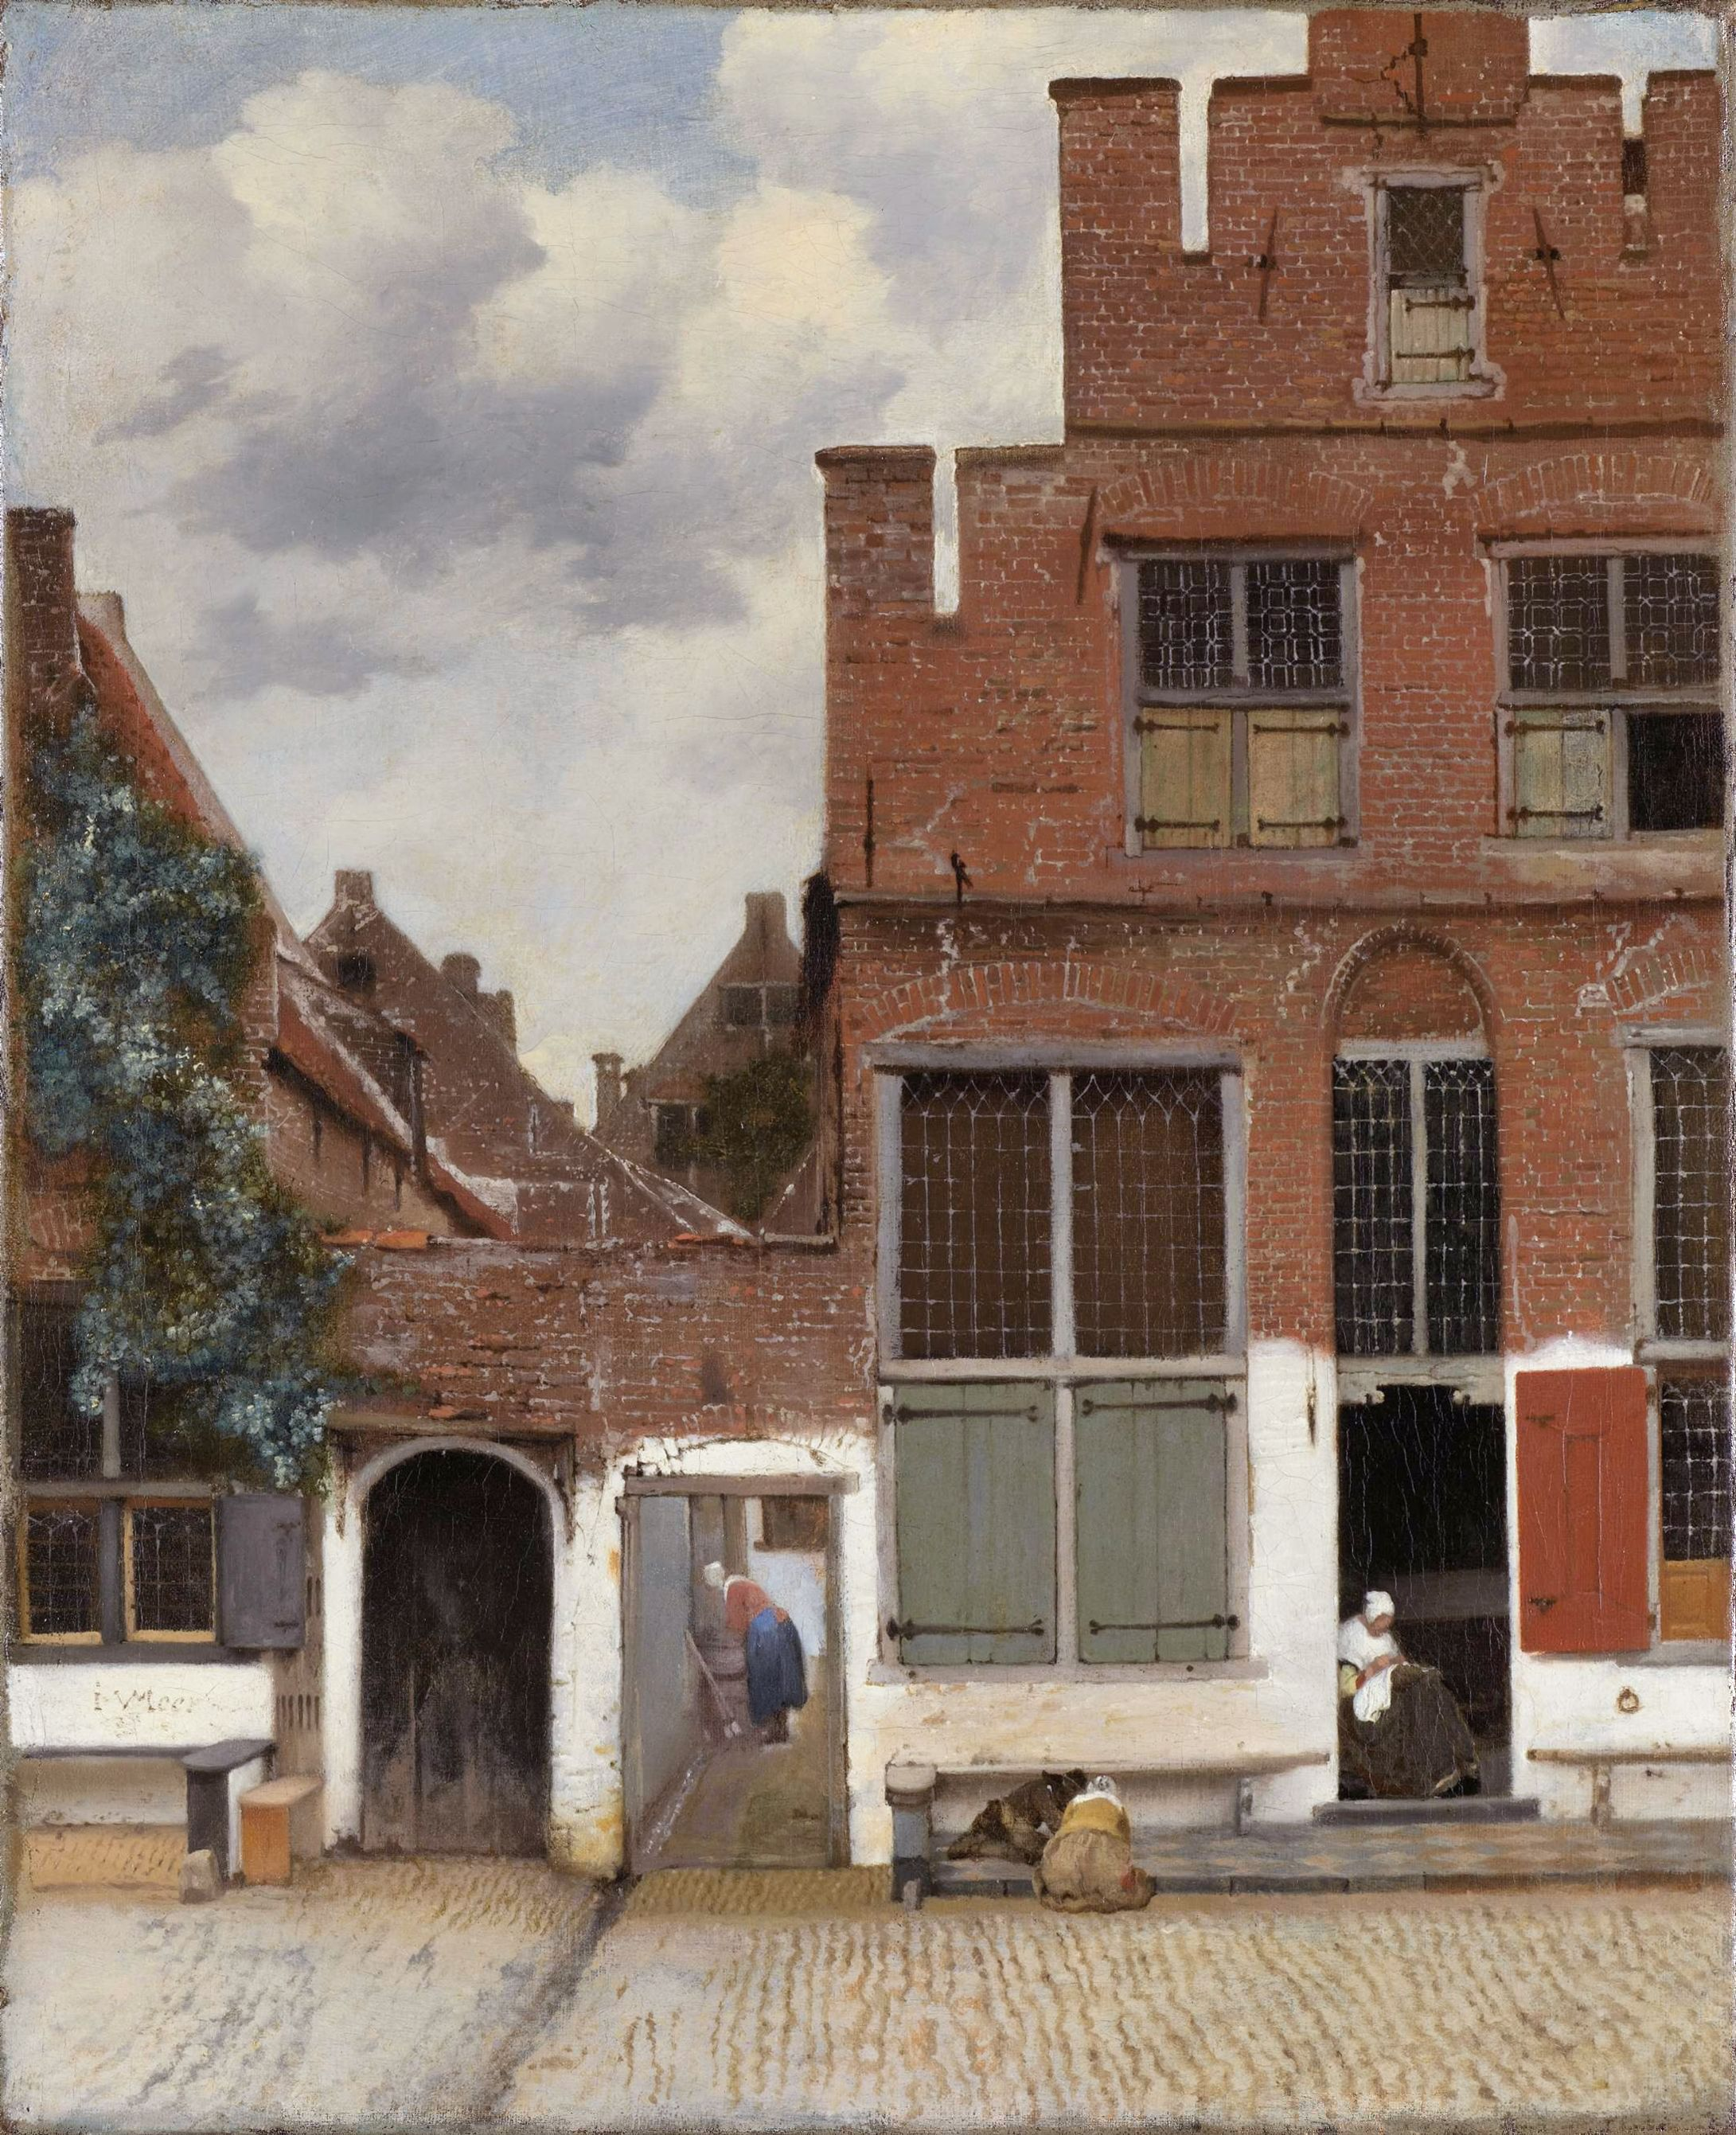 Jan Vermeer van Delft- La Callejuela (Het Straatje)  realizado entre 1657 y 1658.